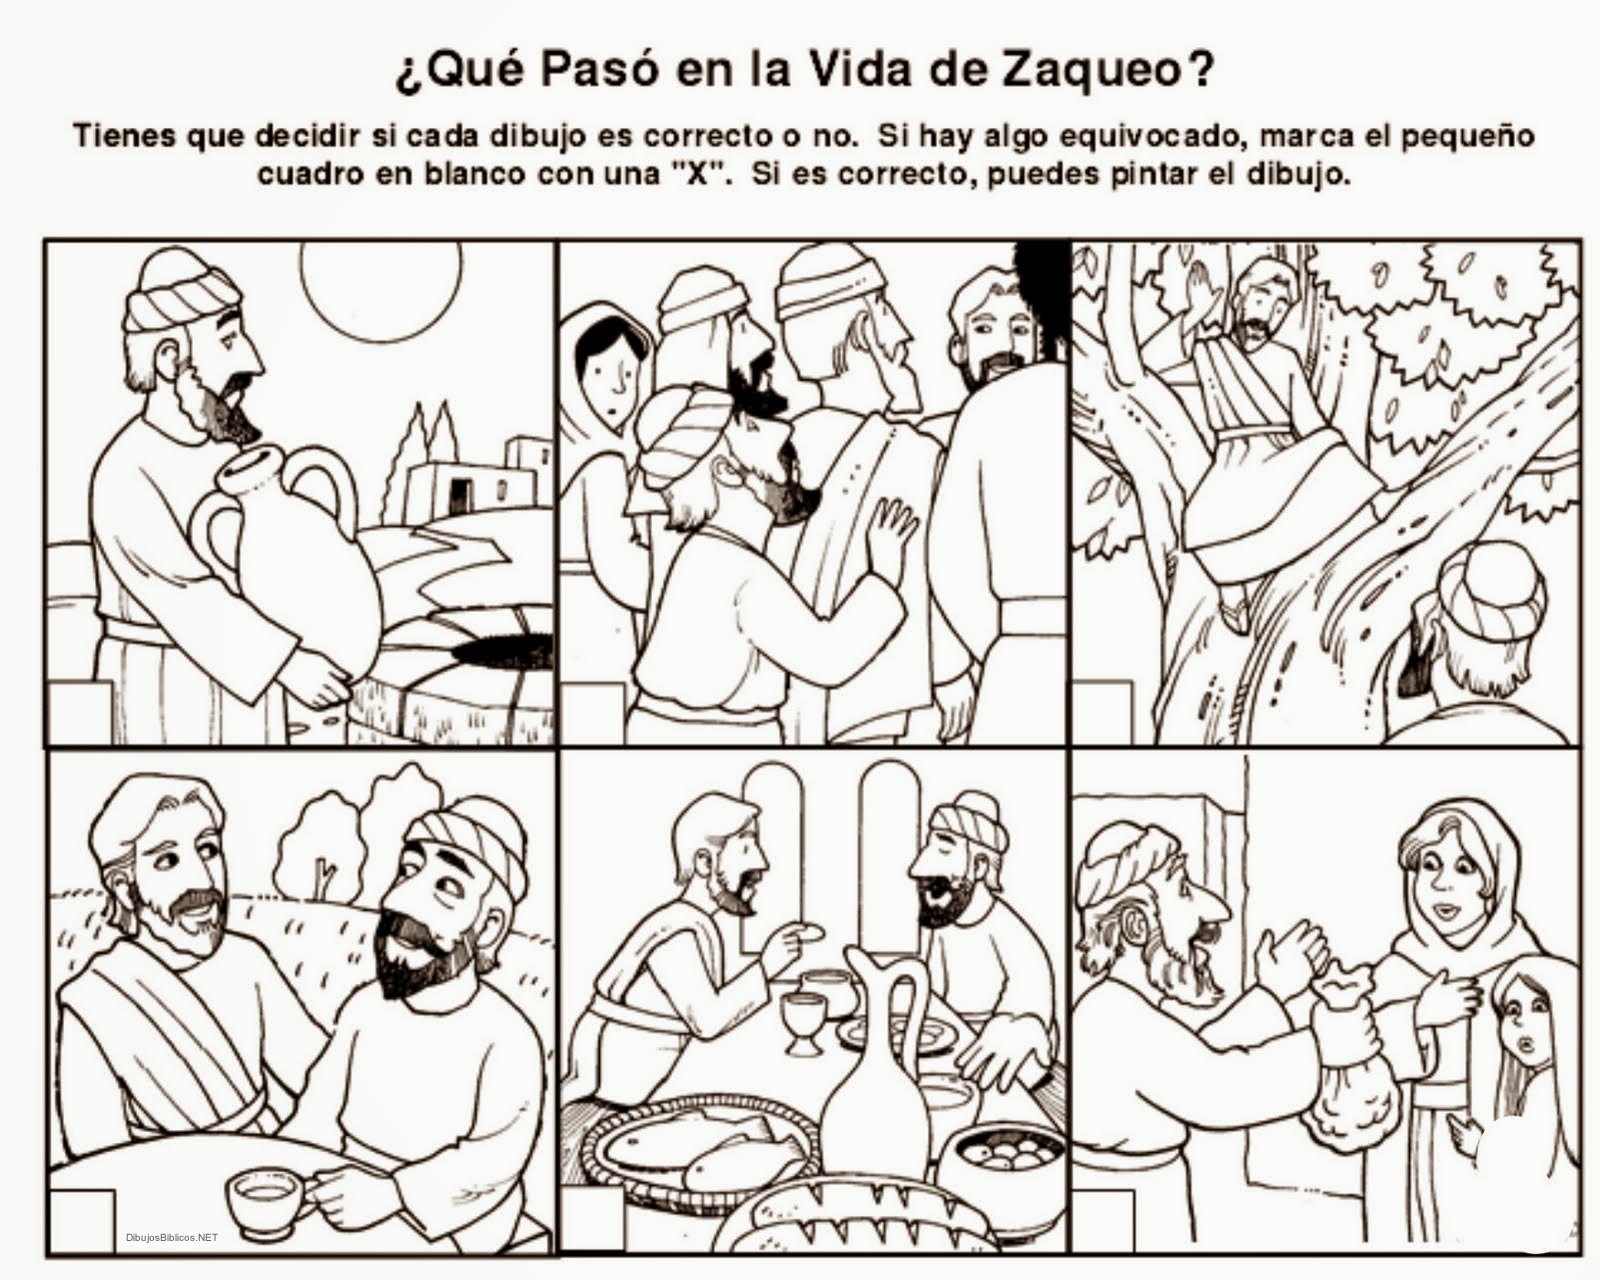 Dibujos_Para_Colorear_De_Zaqueo16.jpg